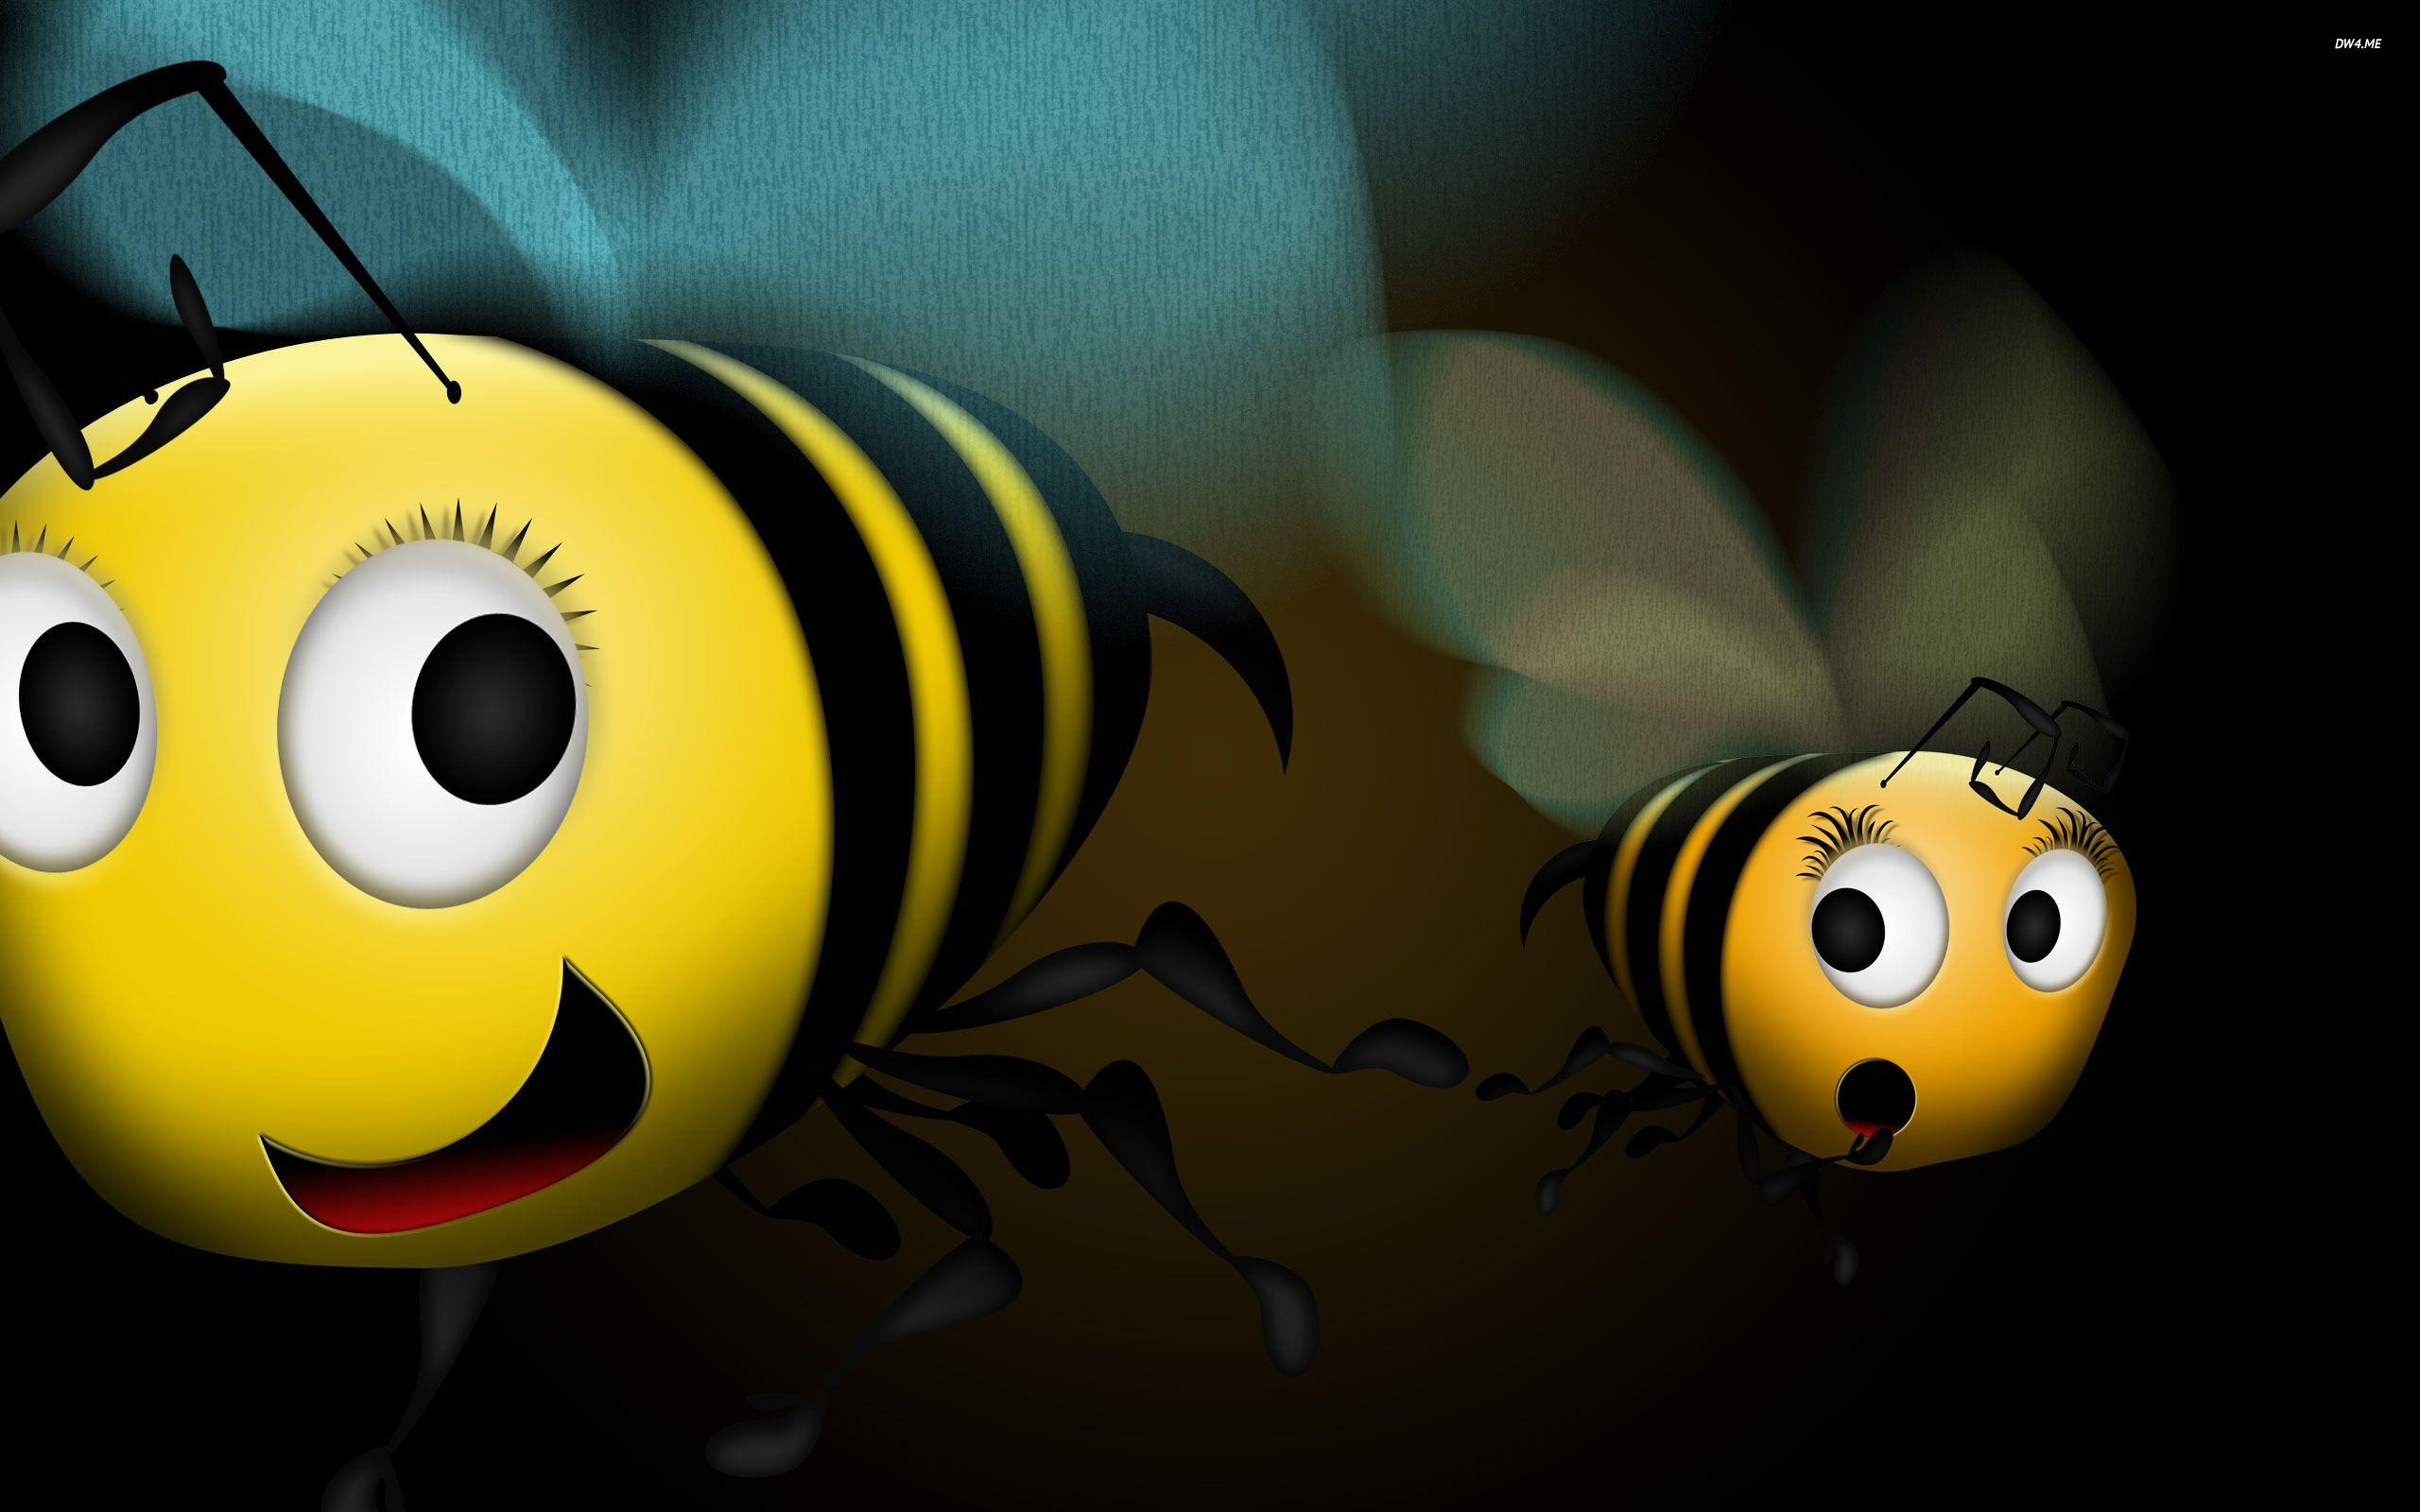 Cute Bee Wallpapers - Wallpaper Cave